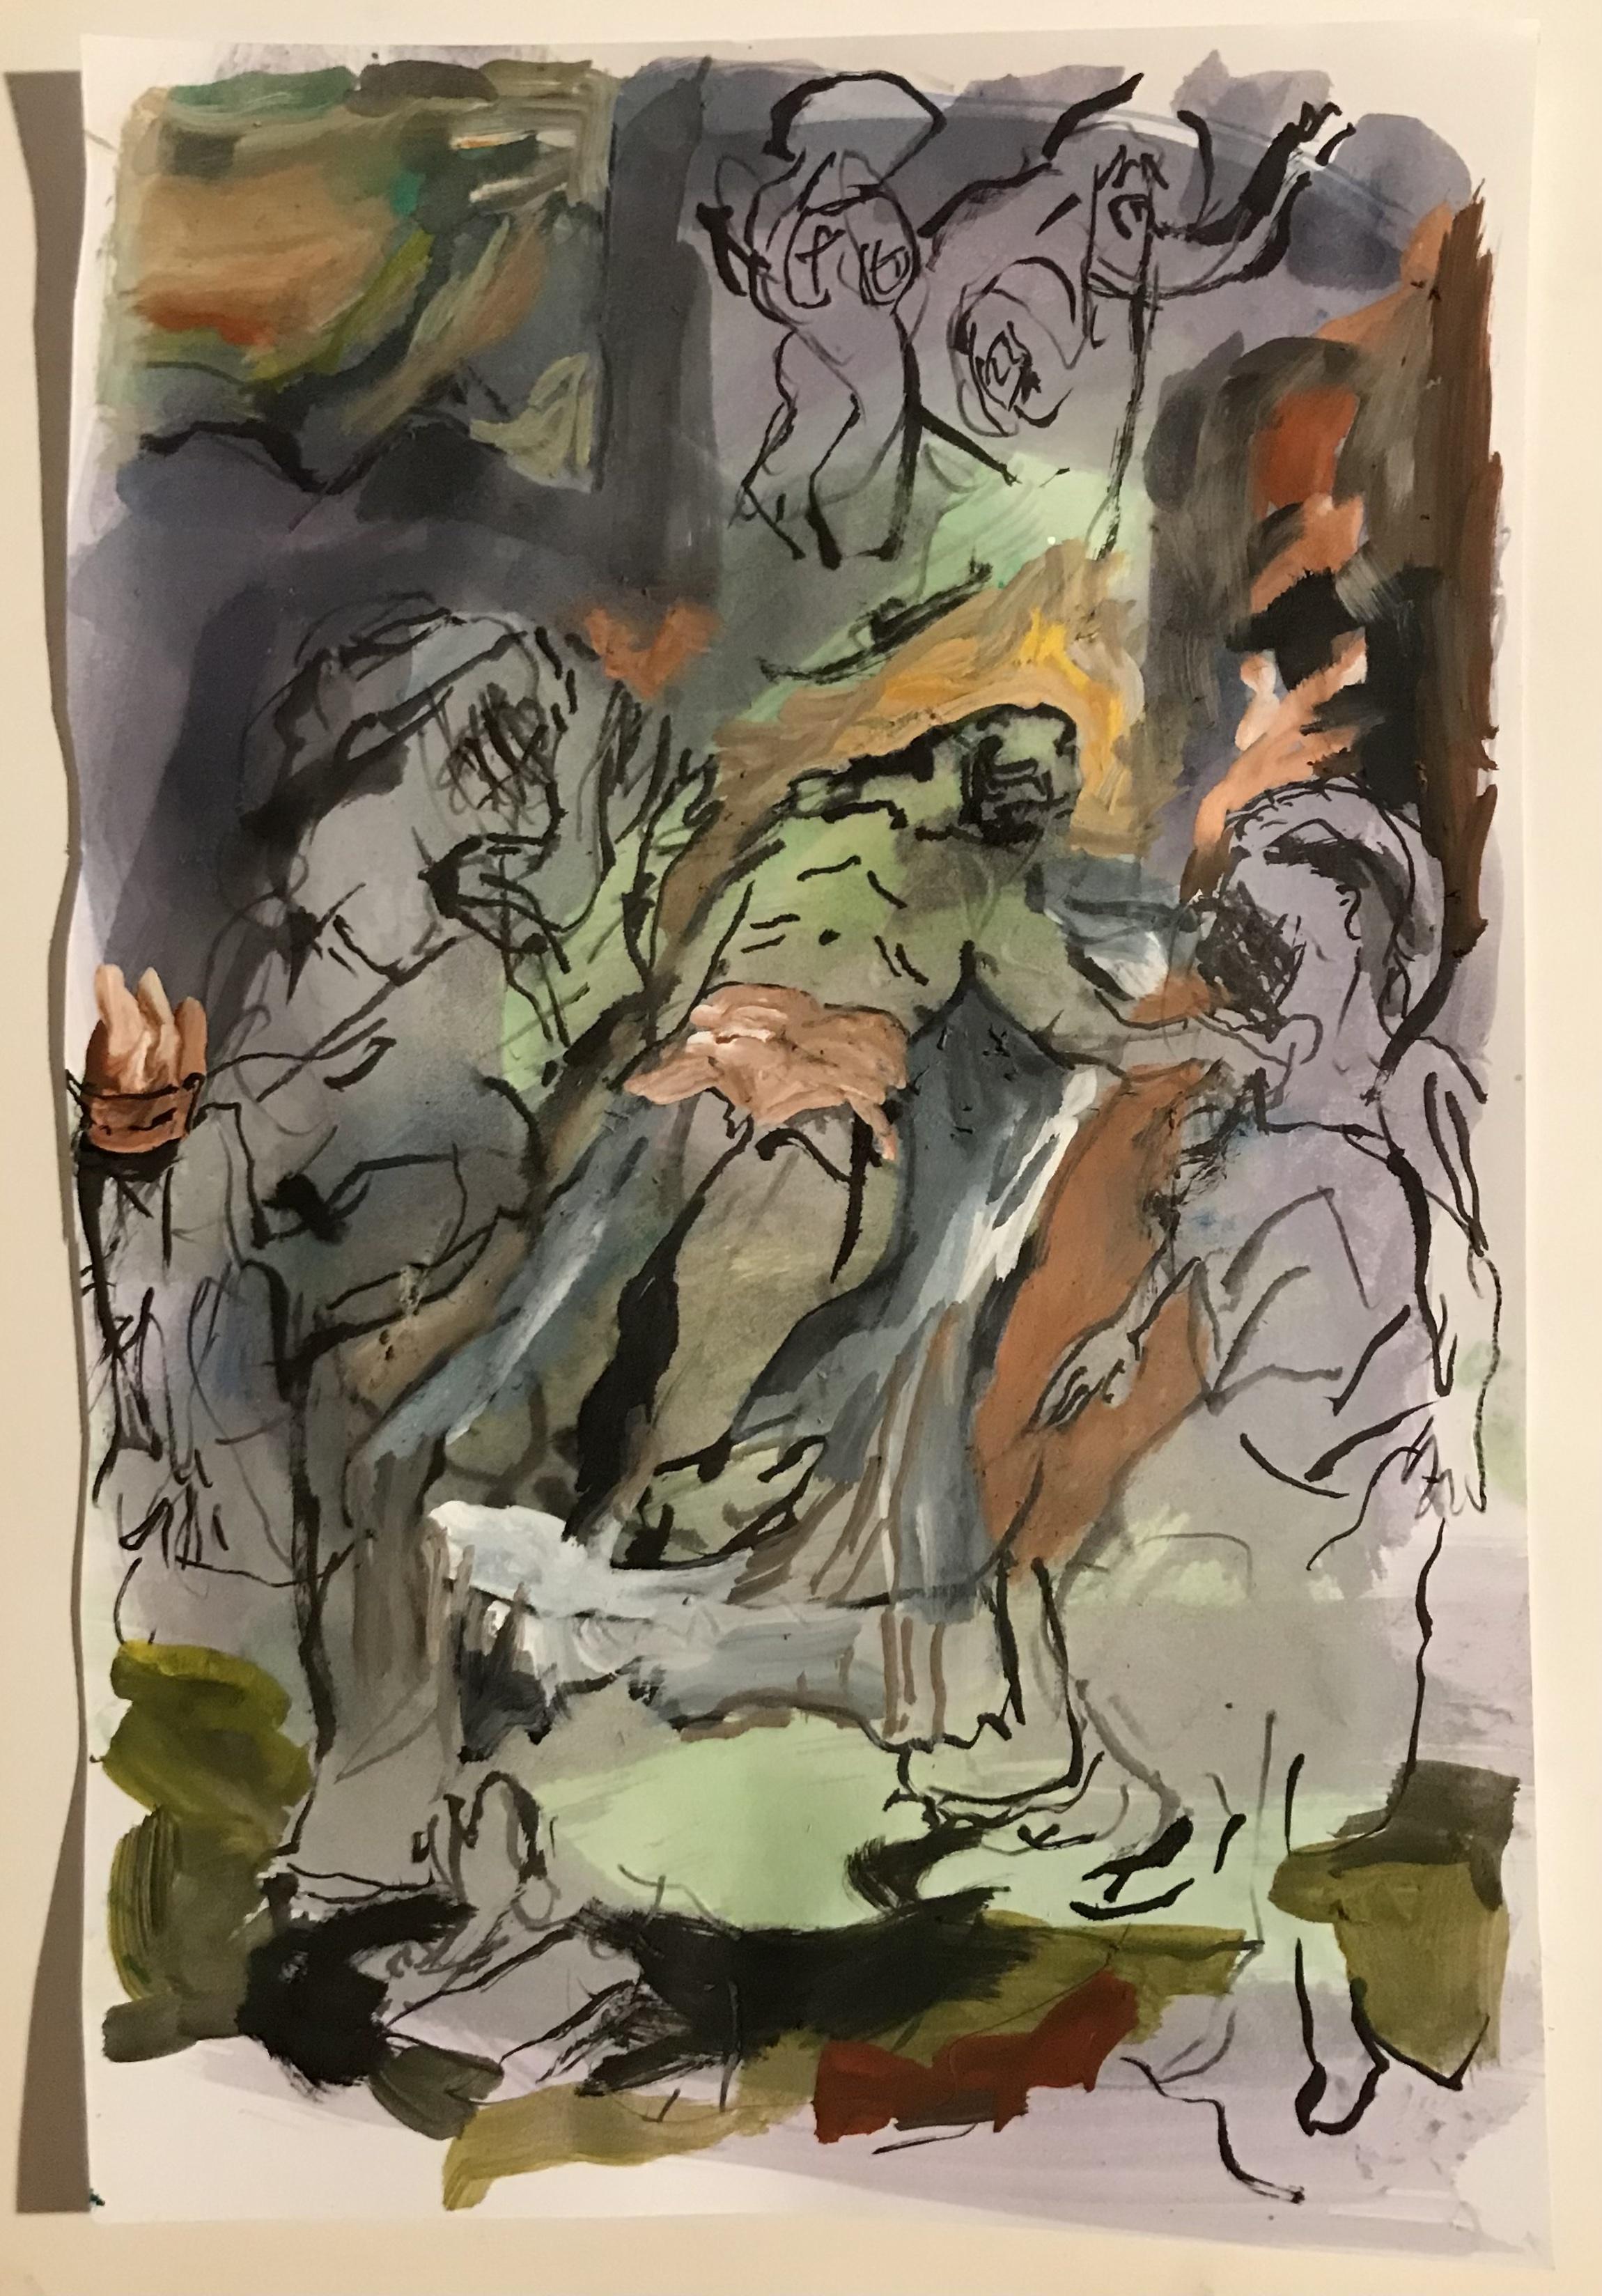 Untitled, paint on paper cm 17x25, 2021